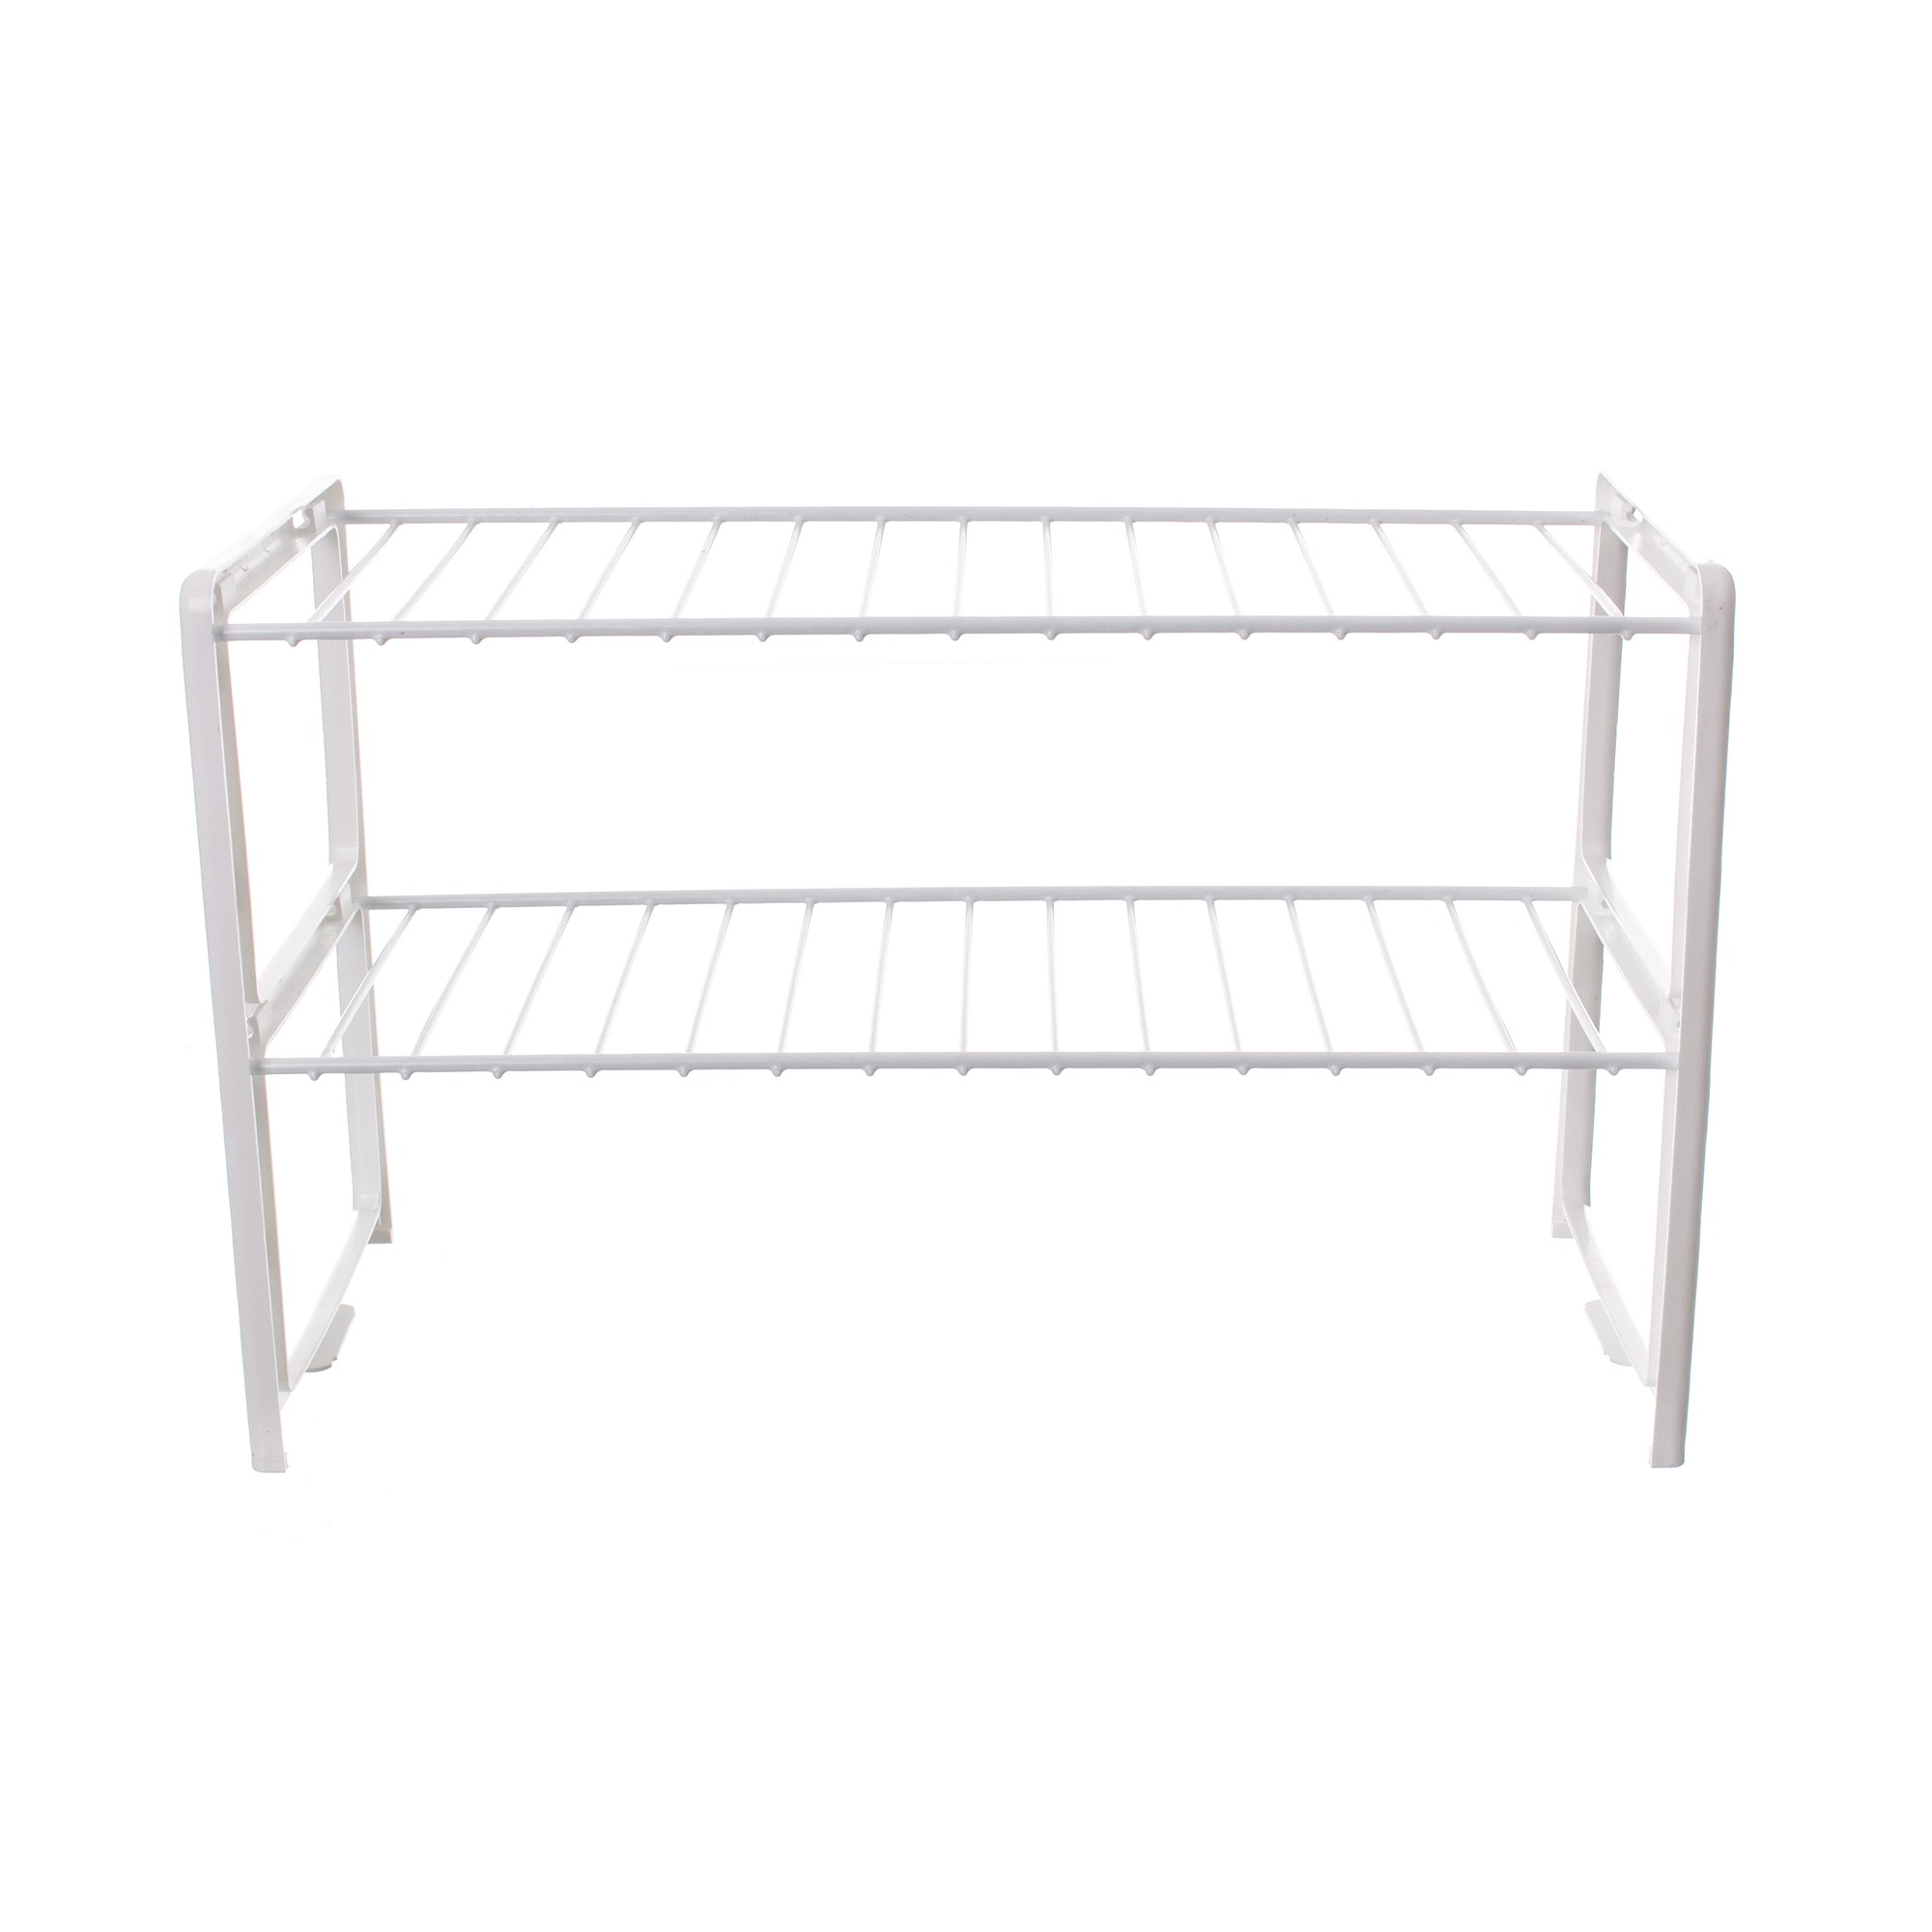 Organizador Multiuso 25x40x16 cm Branco - Metaltru